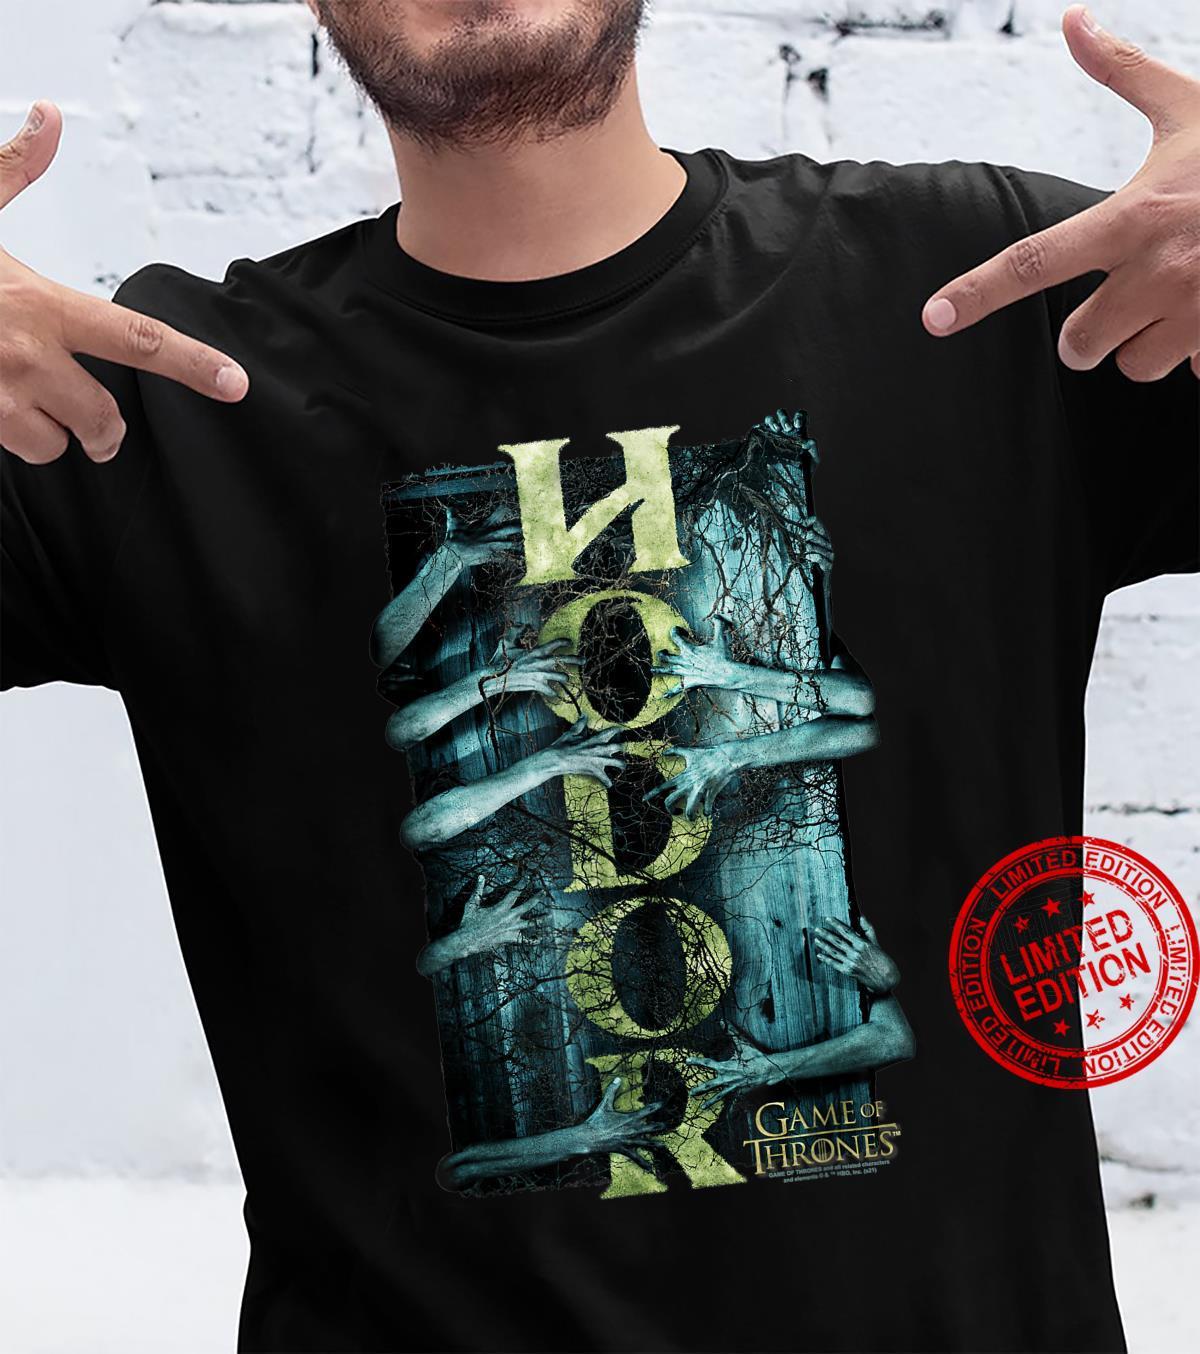 Game of Thrones Hodor Shirt